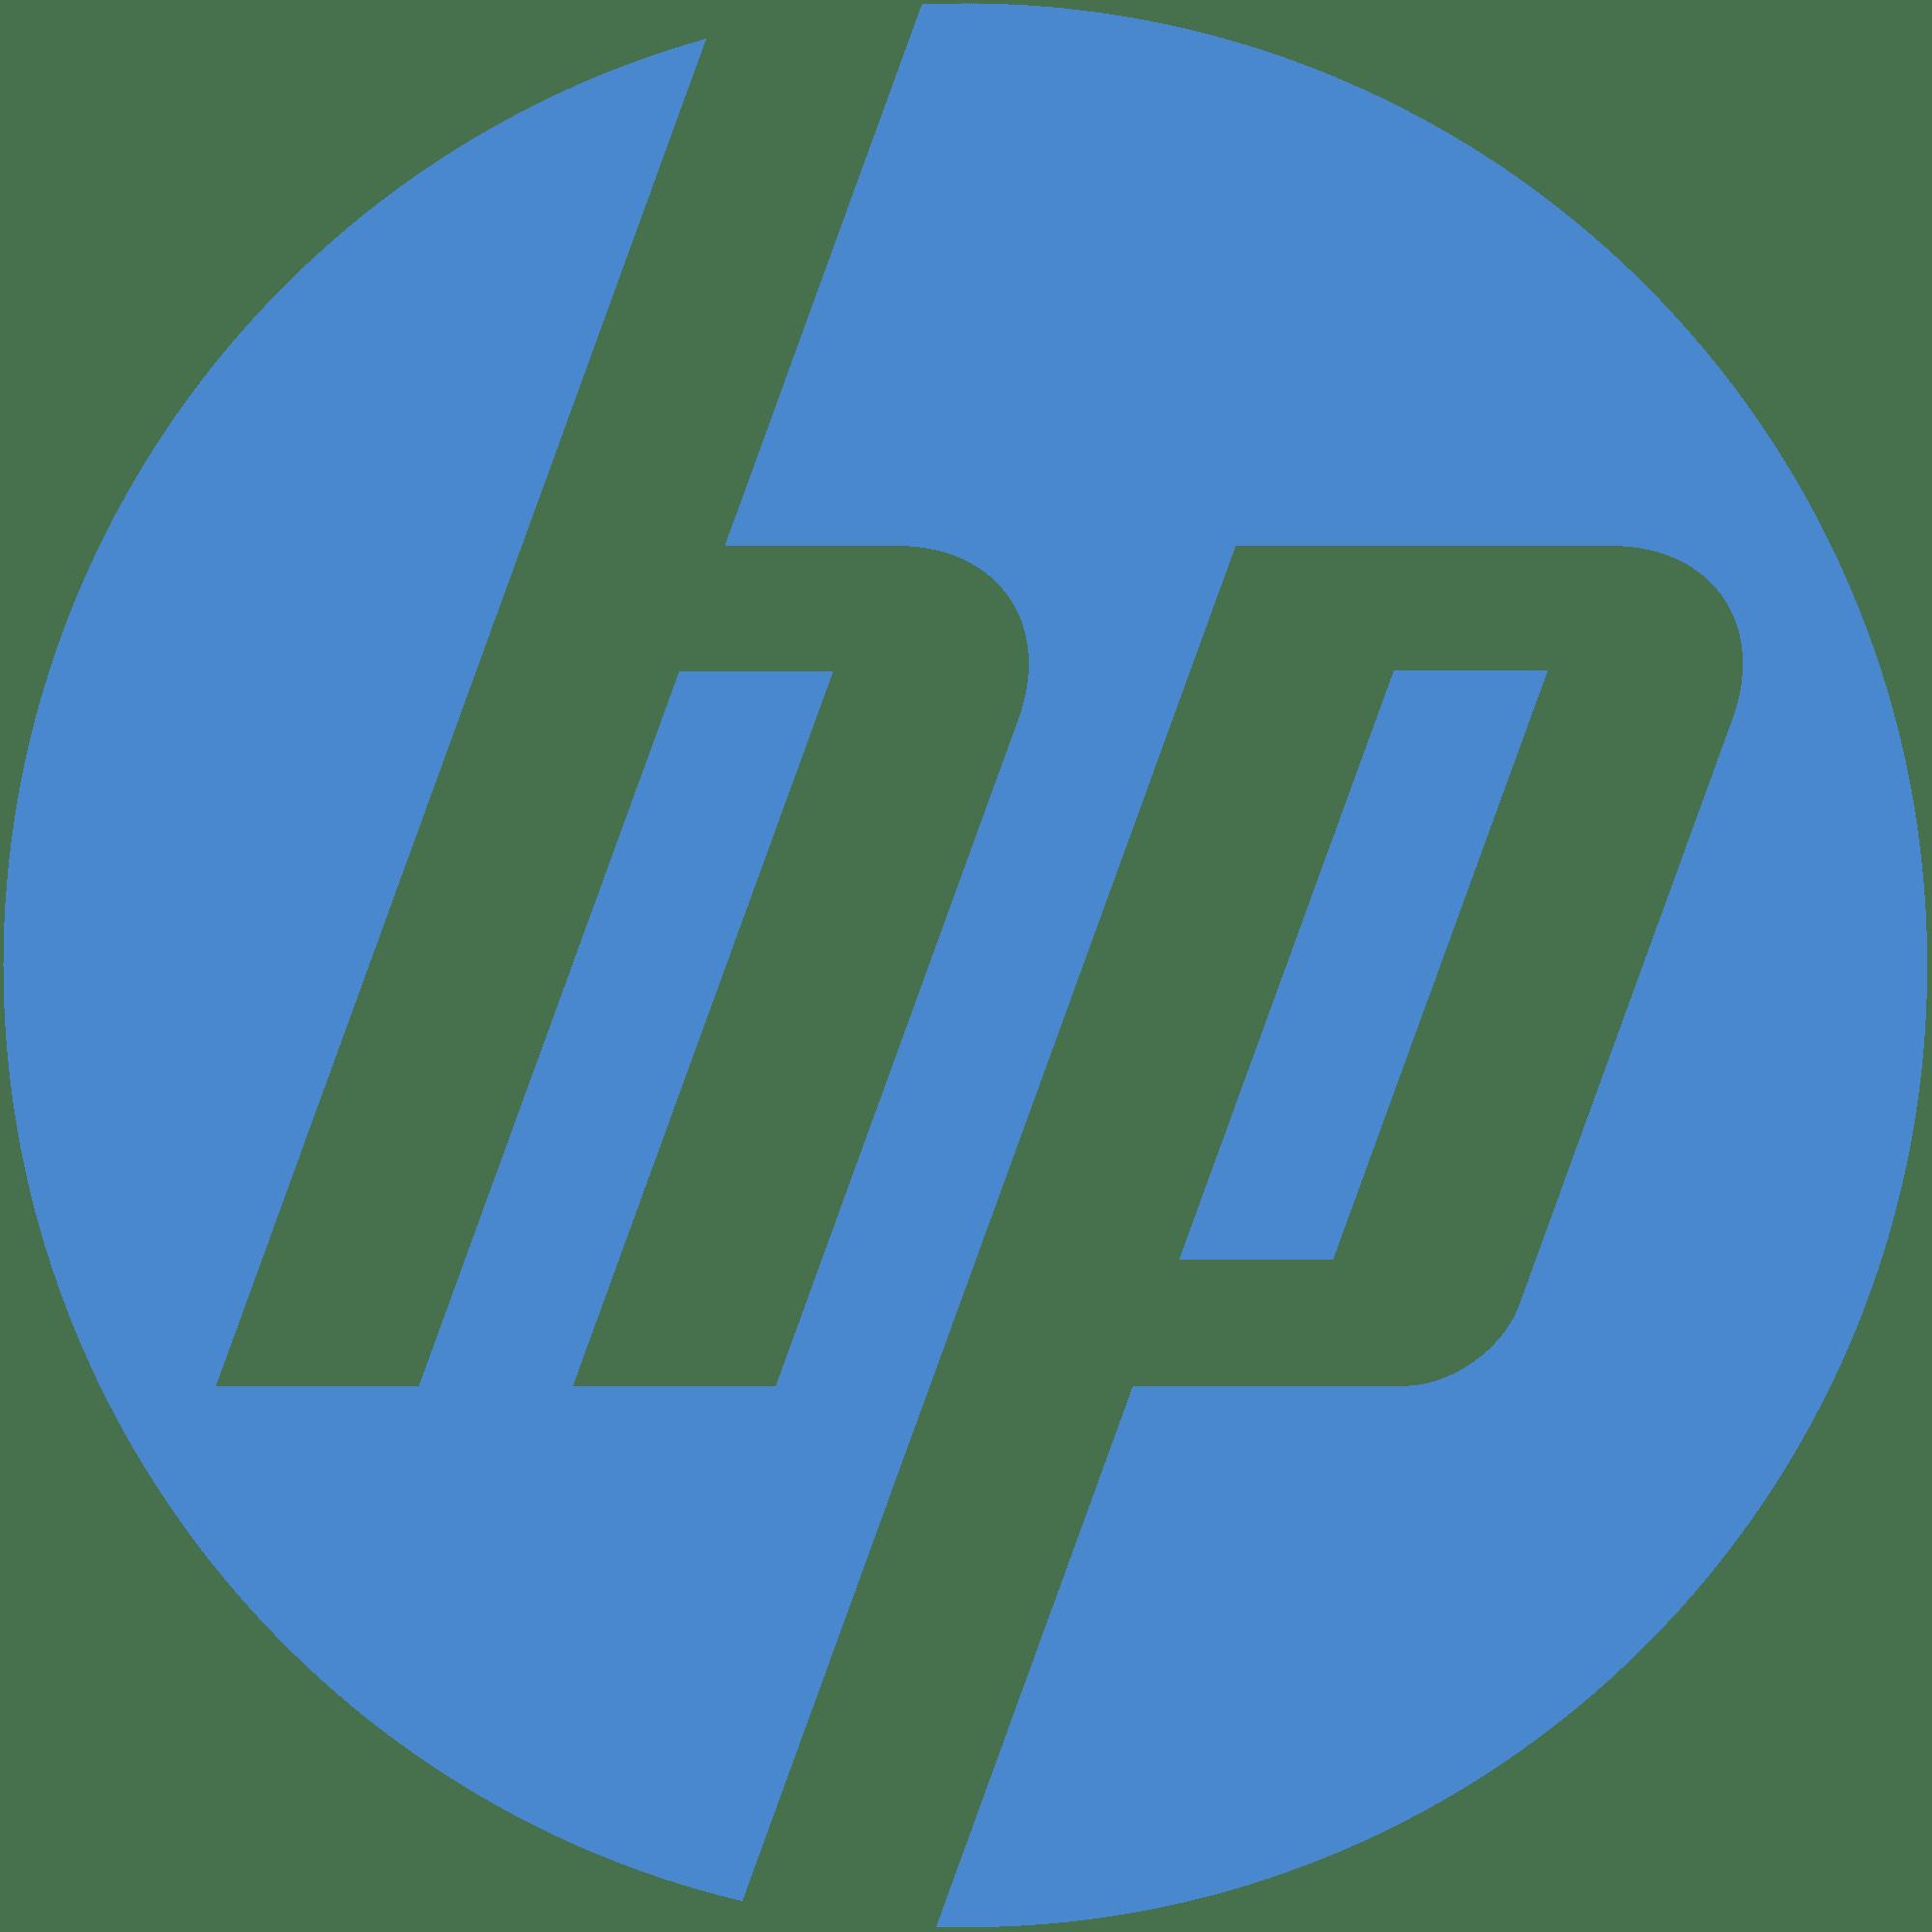 HP LaserJet Pro MFP M127fw Driver